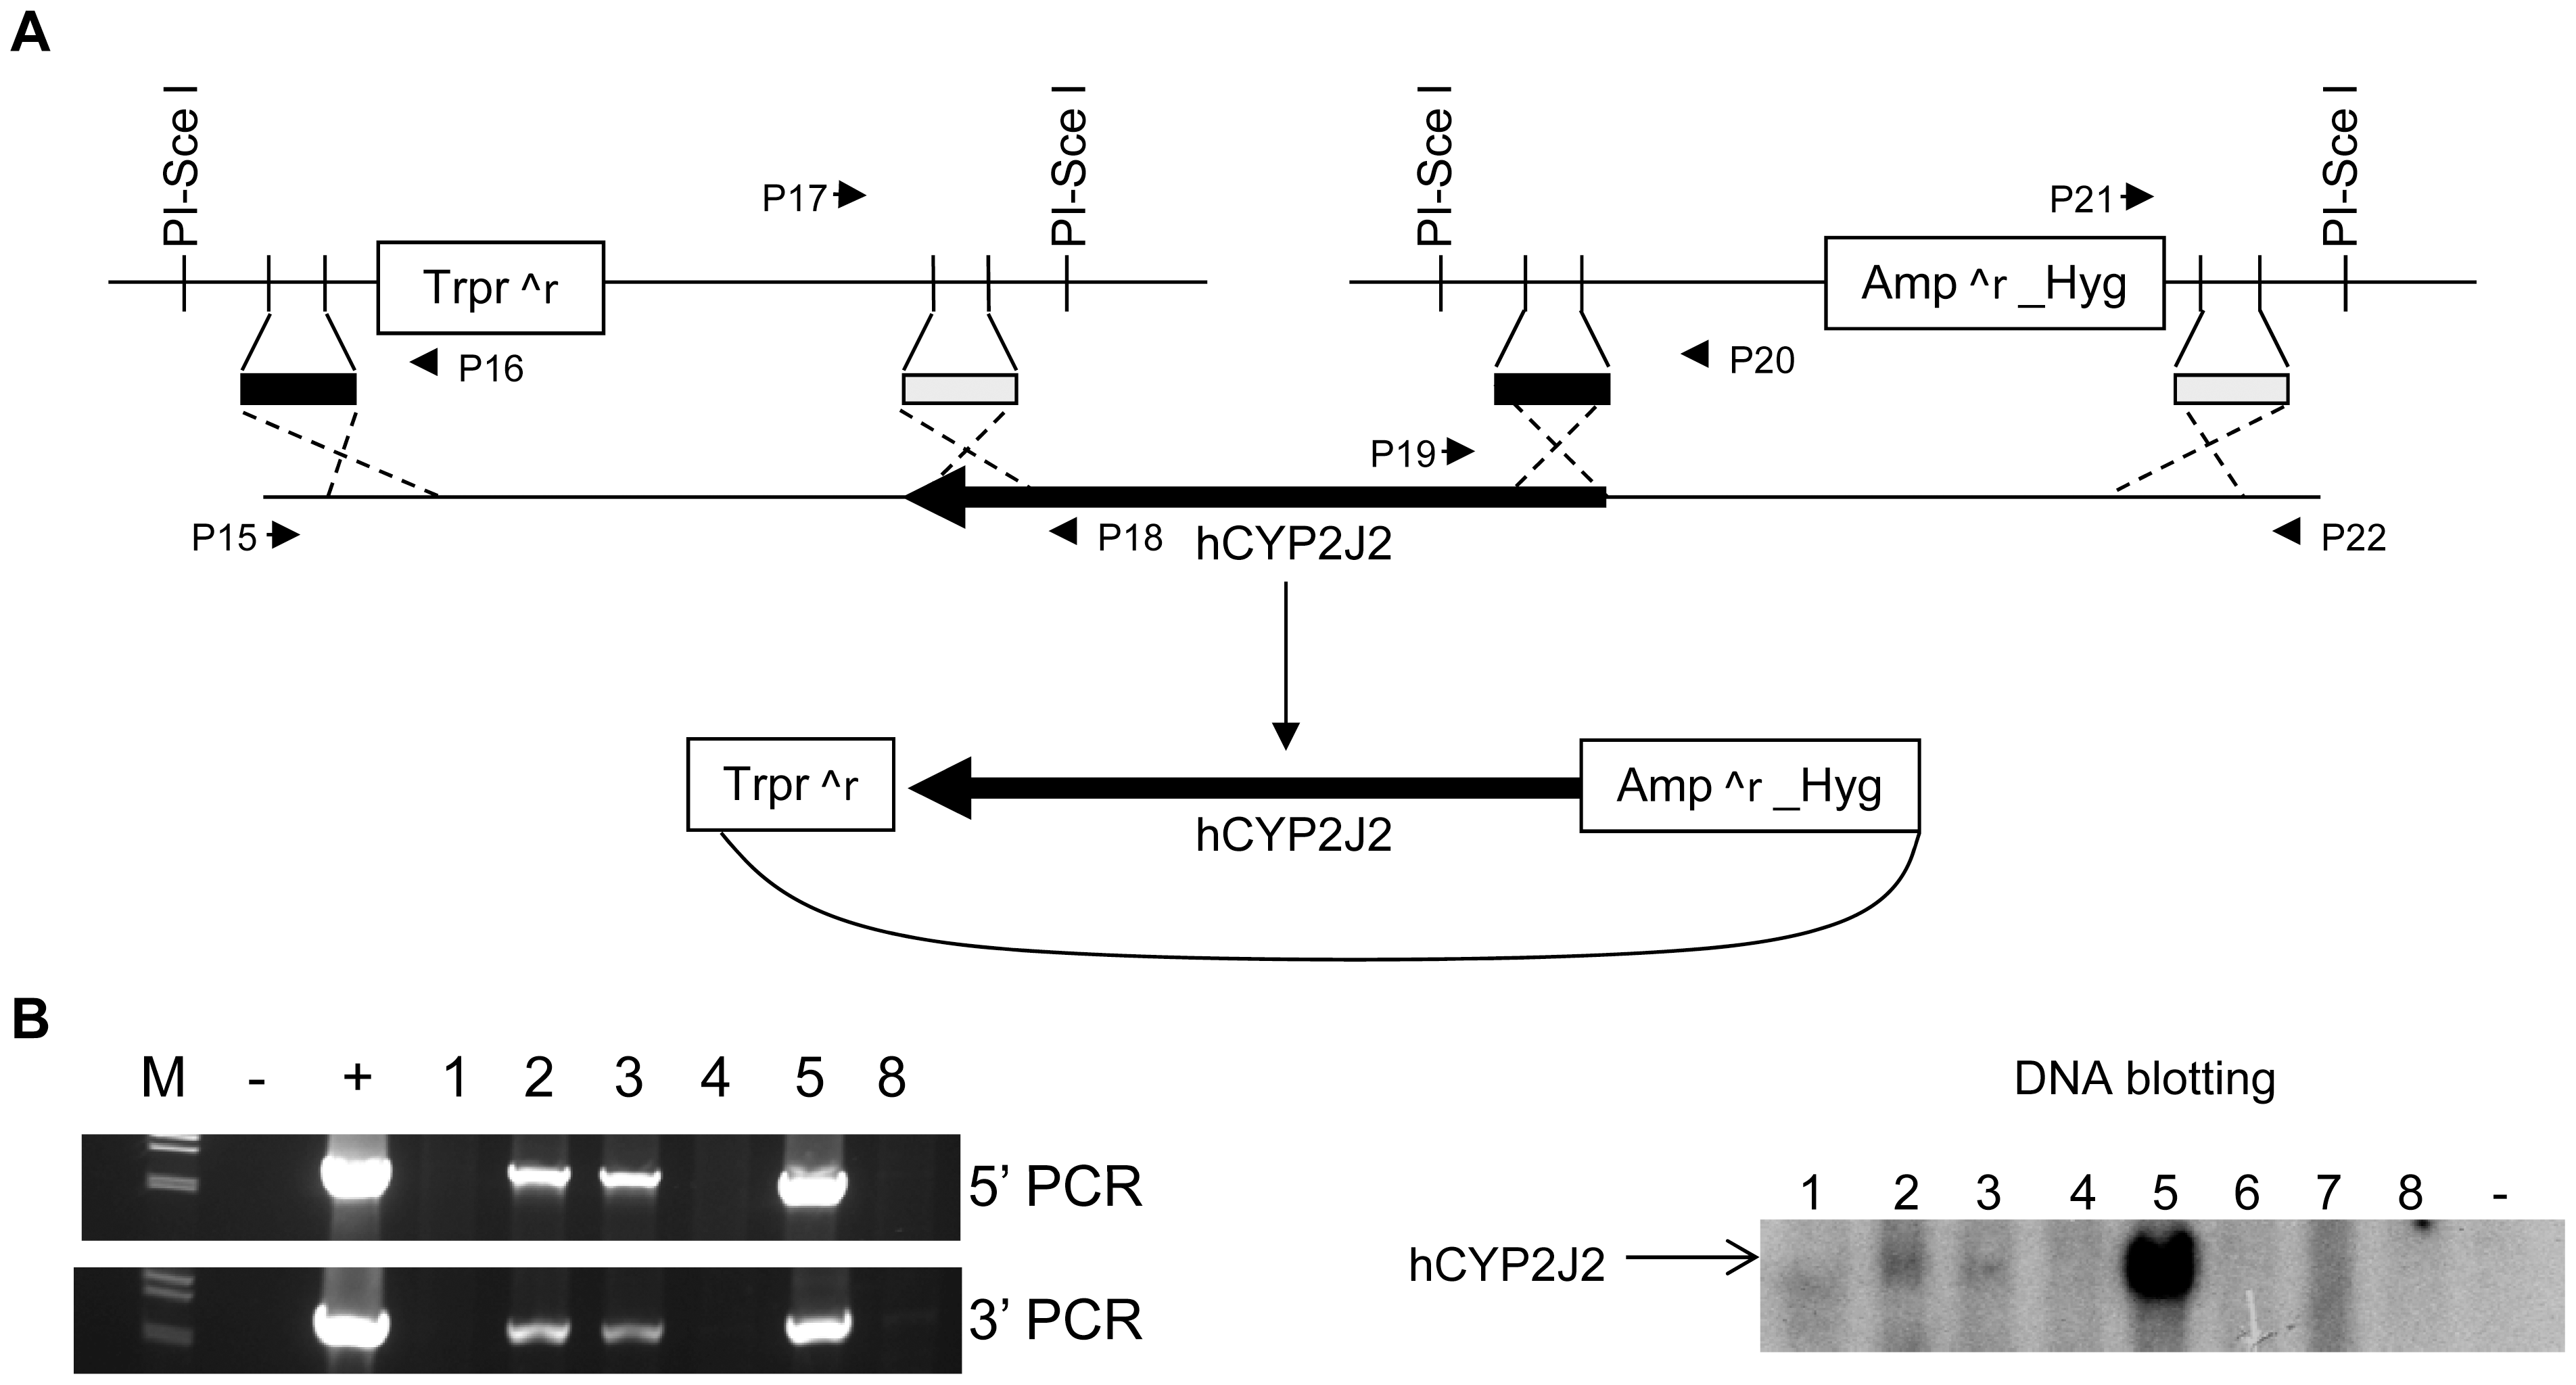 Creation of human <i>CYP2J2</i> transgenic mice.